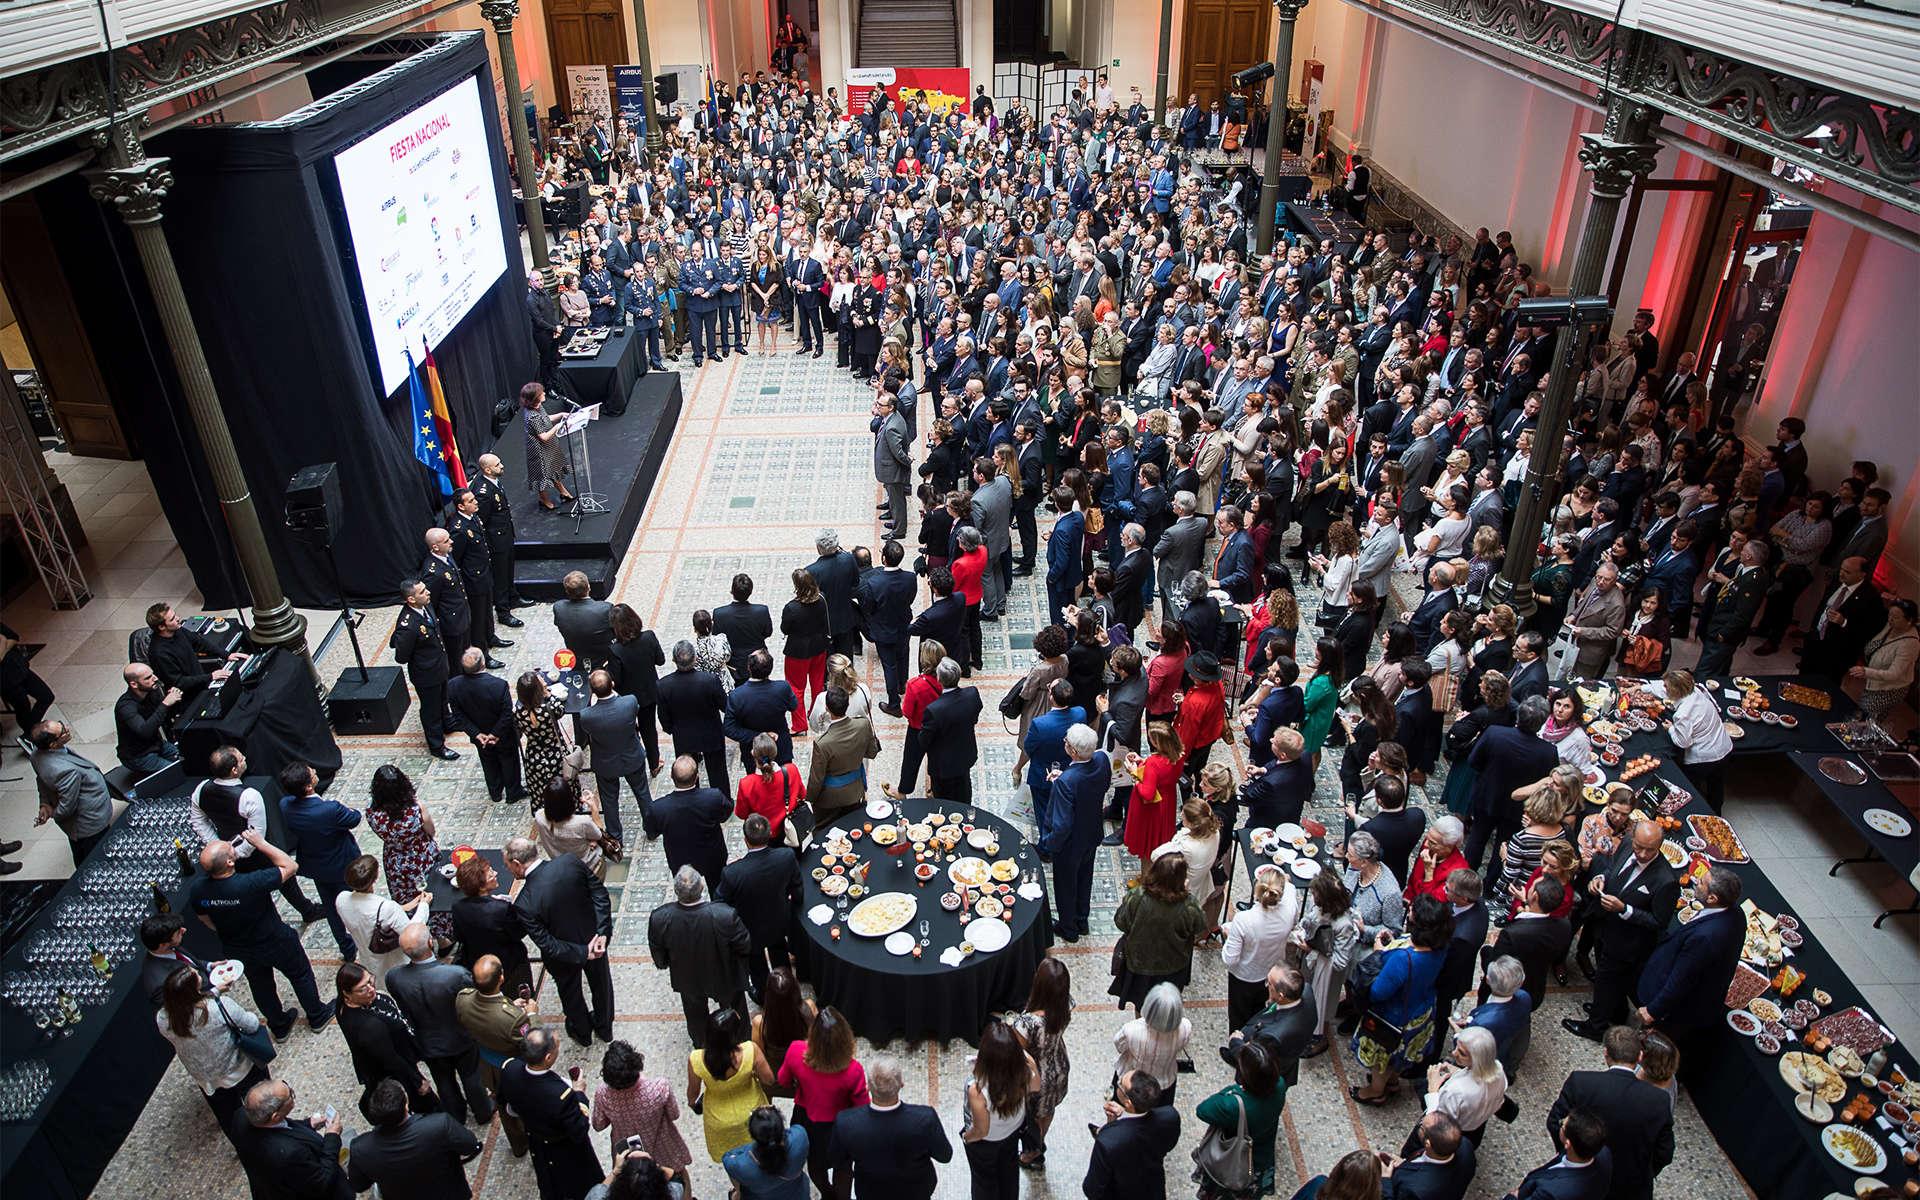 spain-embassy-crowd